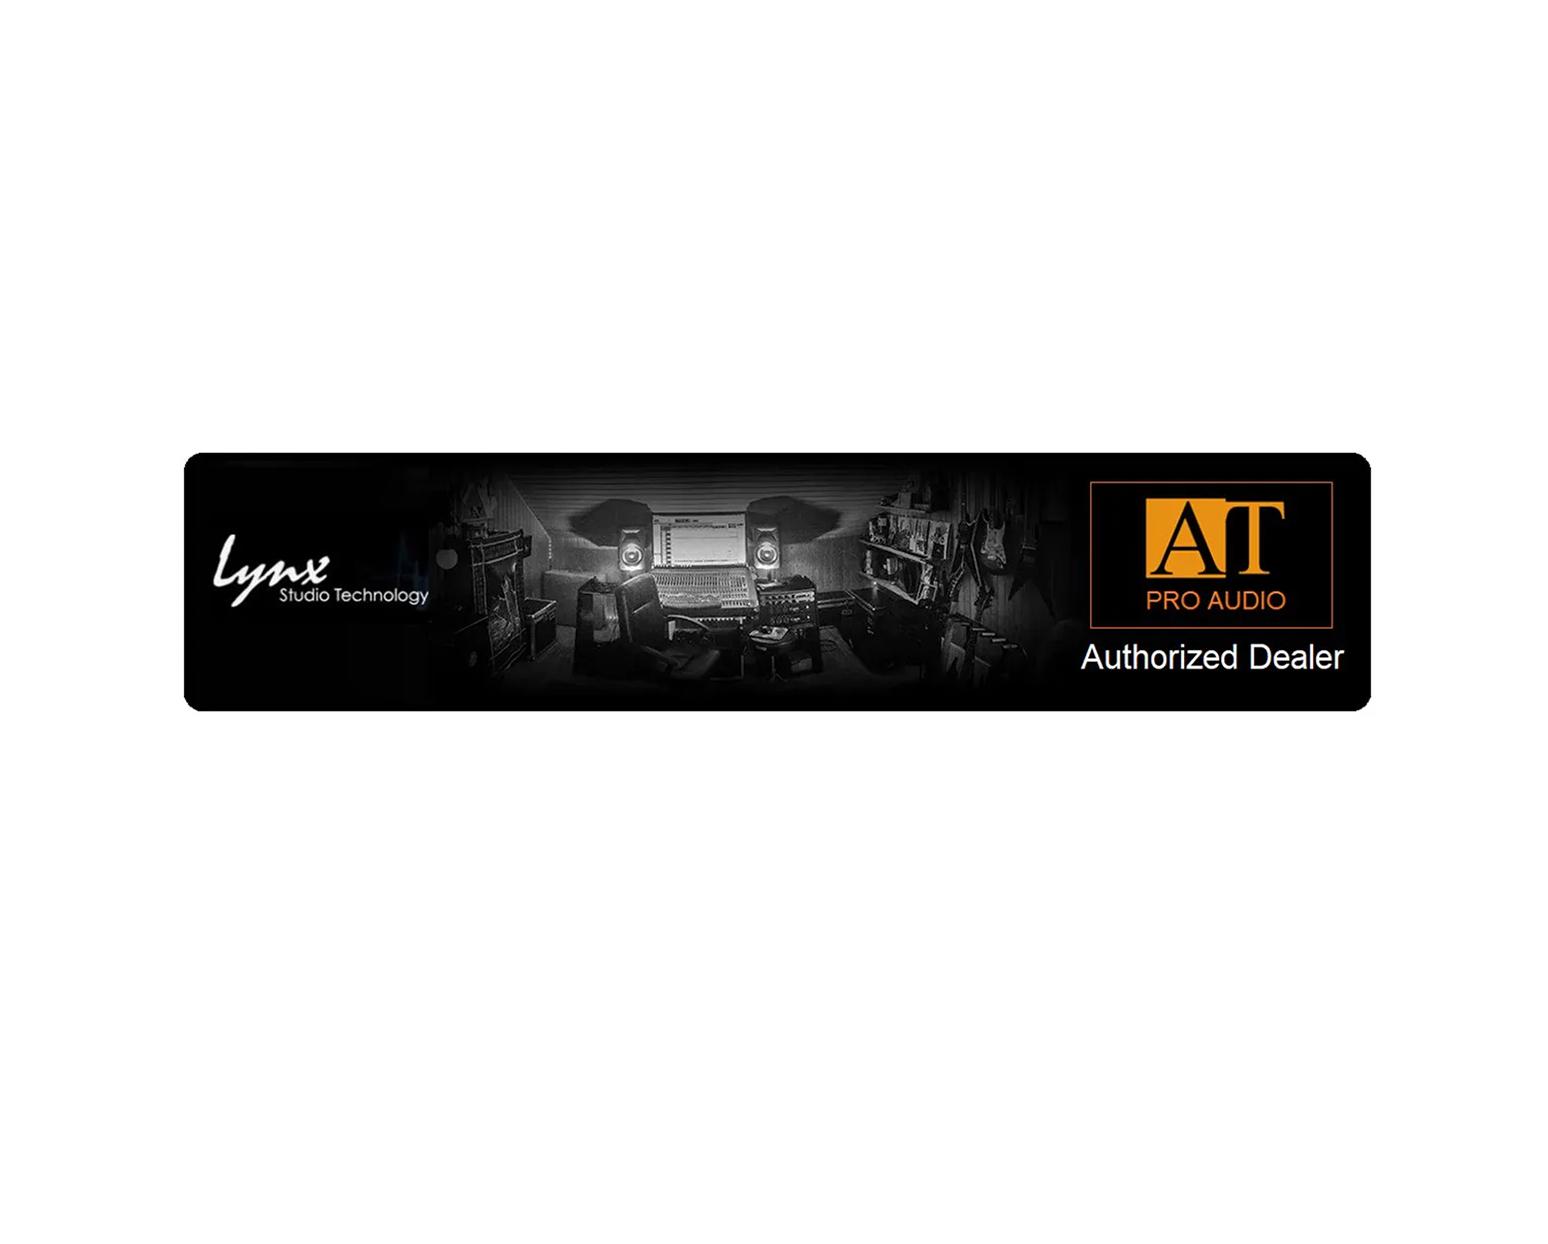 CONVERSOR AD/DA LYNX STUDIO TECHNOLOGY HILO REFERENCE THUNDERBOLT BLACK